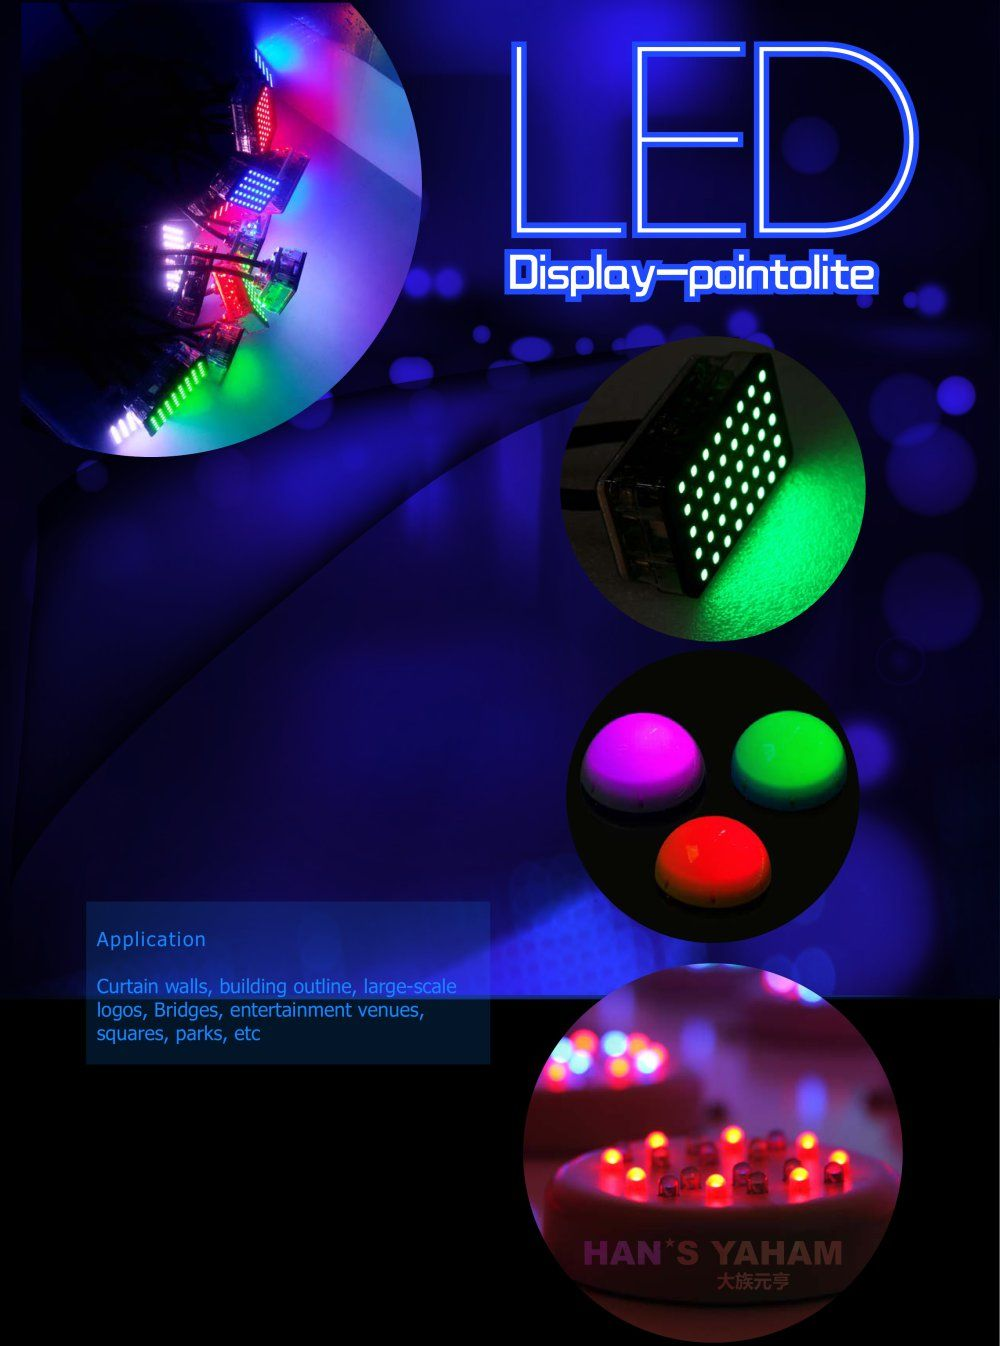 yaham-led-display-pointolite-series-catalogue | Philips Lighting